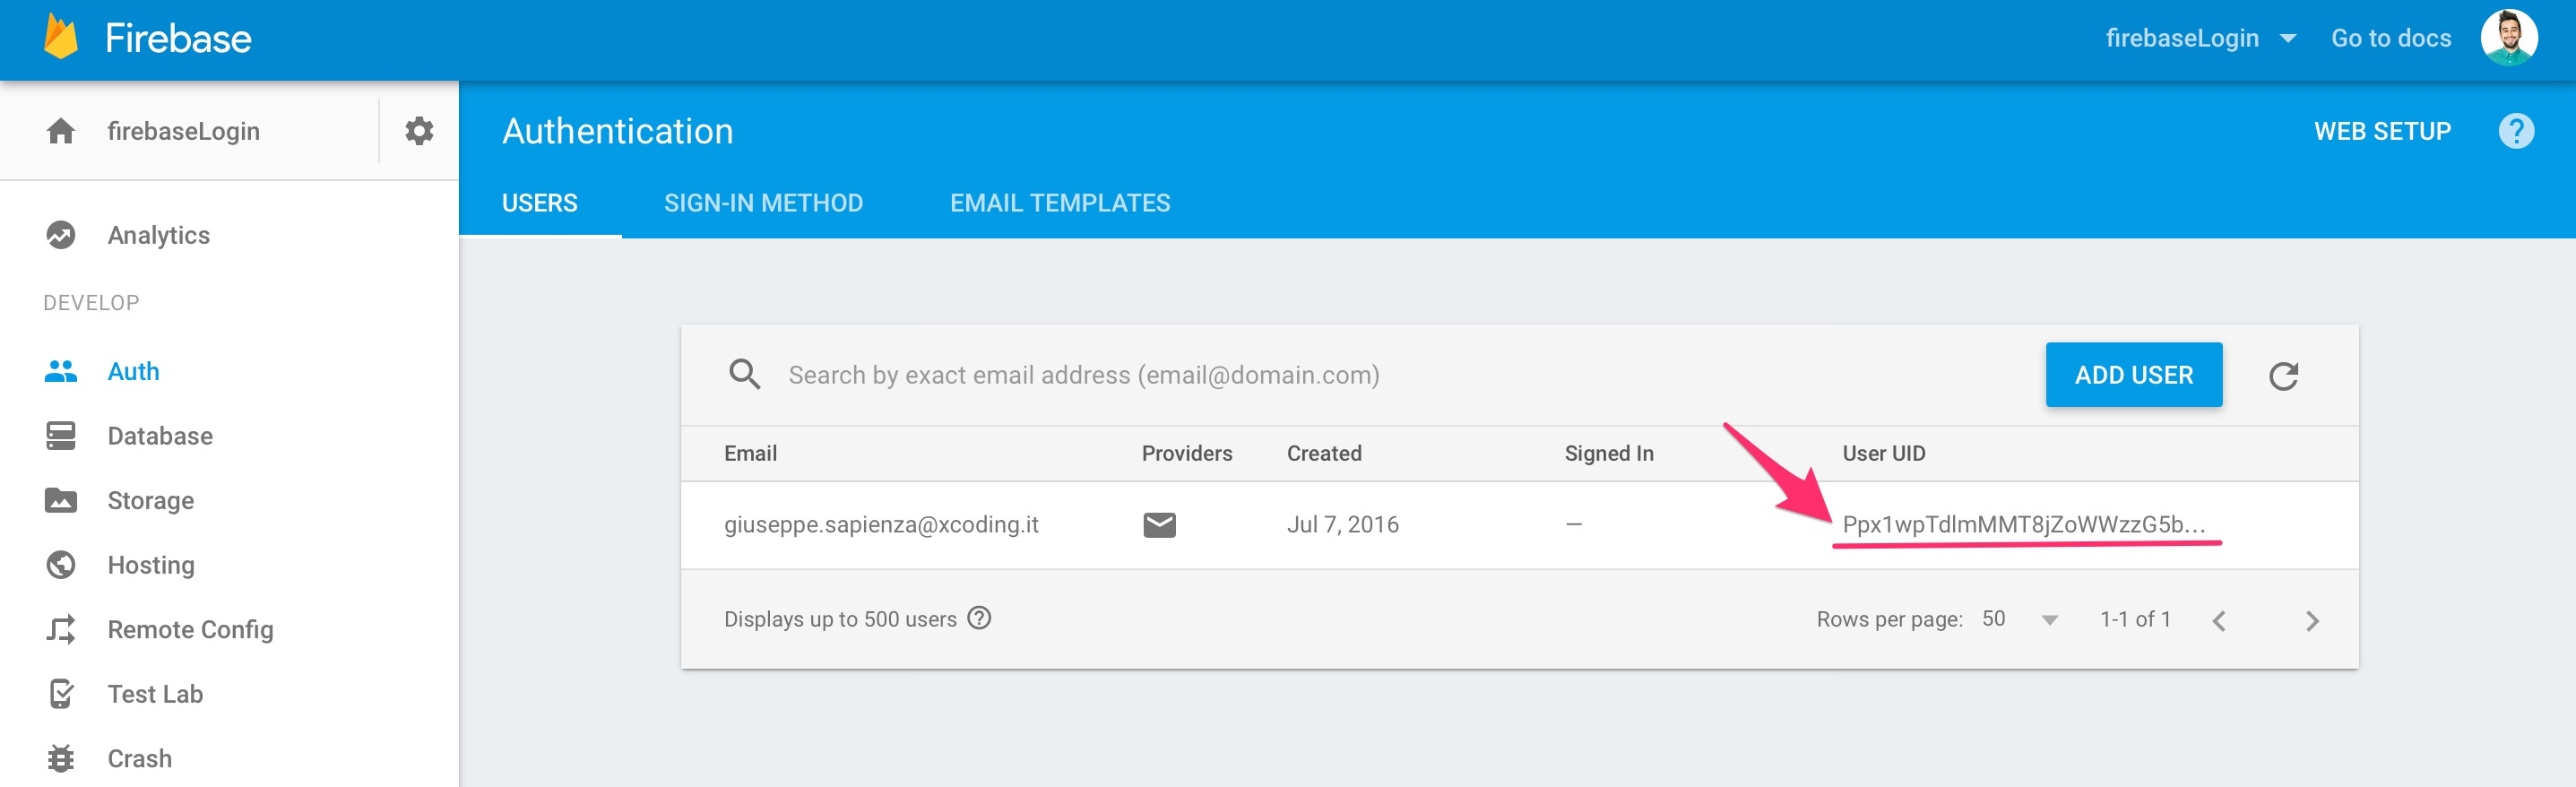 User UUID Firebase autenticazione